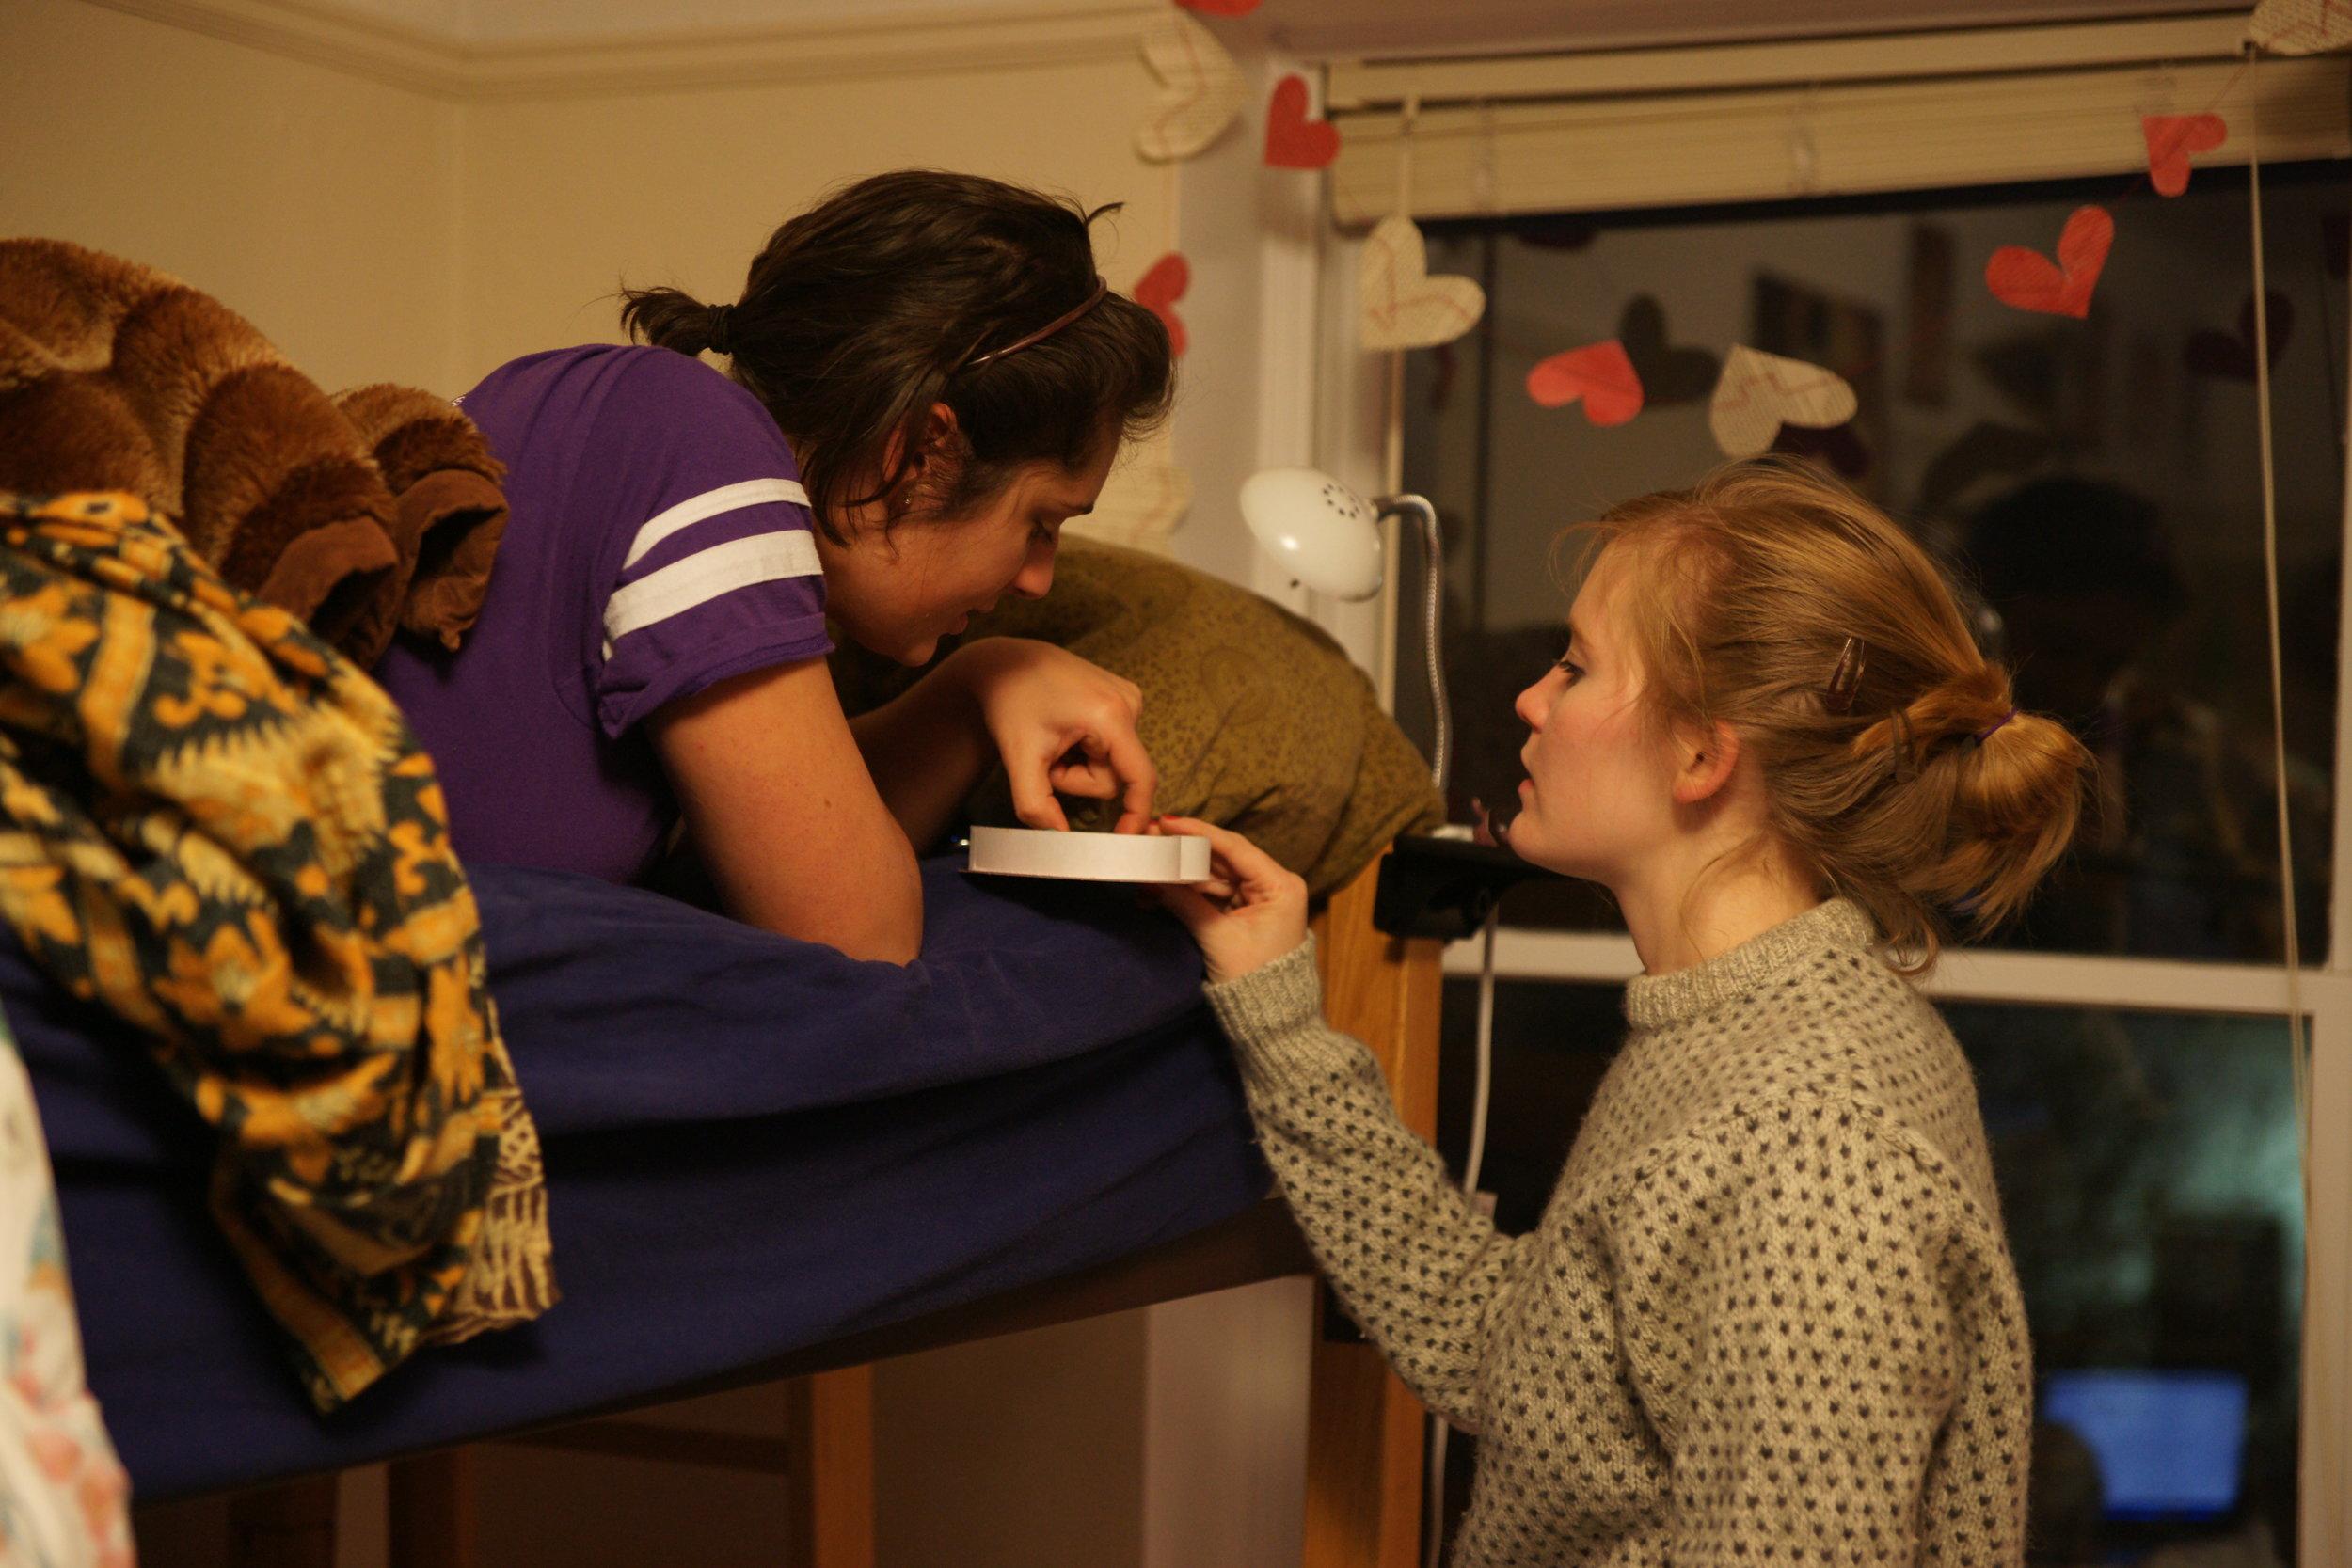 Emily feeding Jess chocolates in bed.